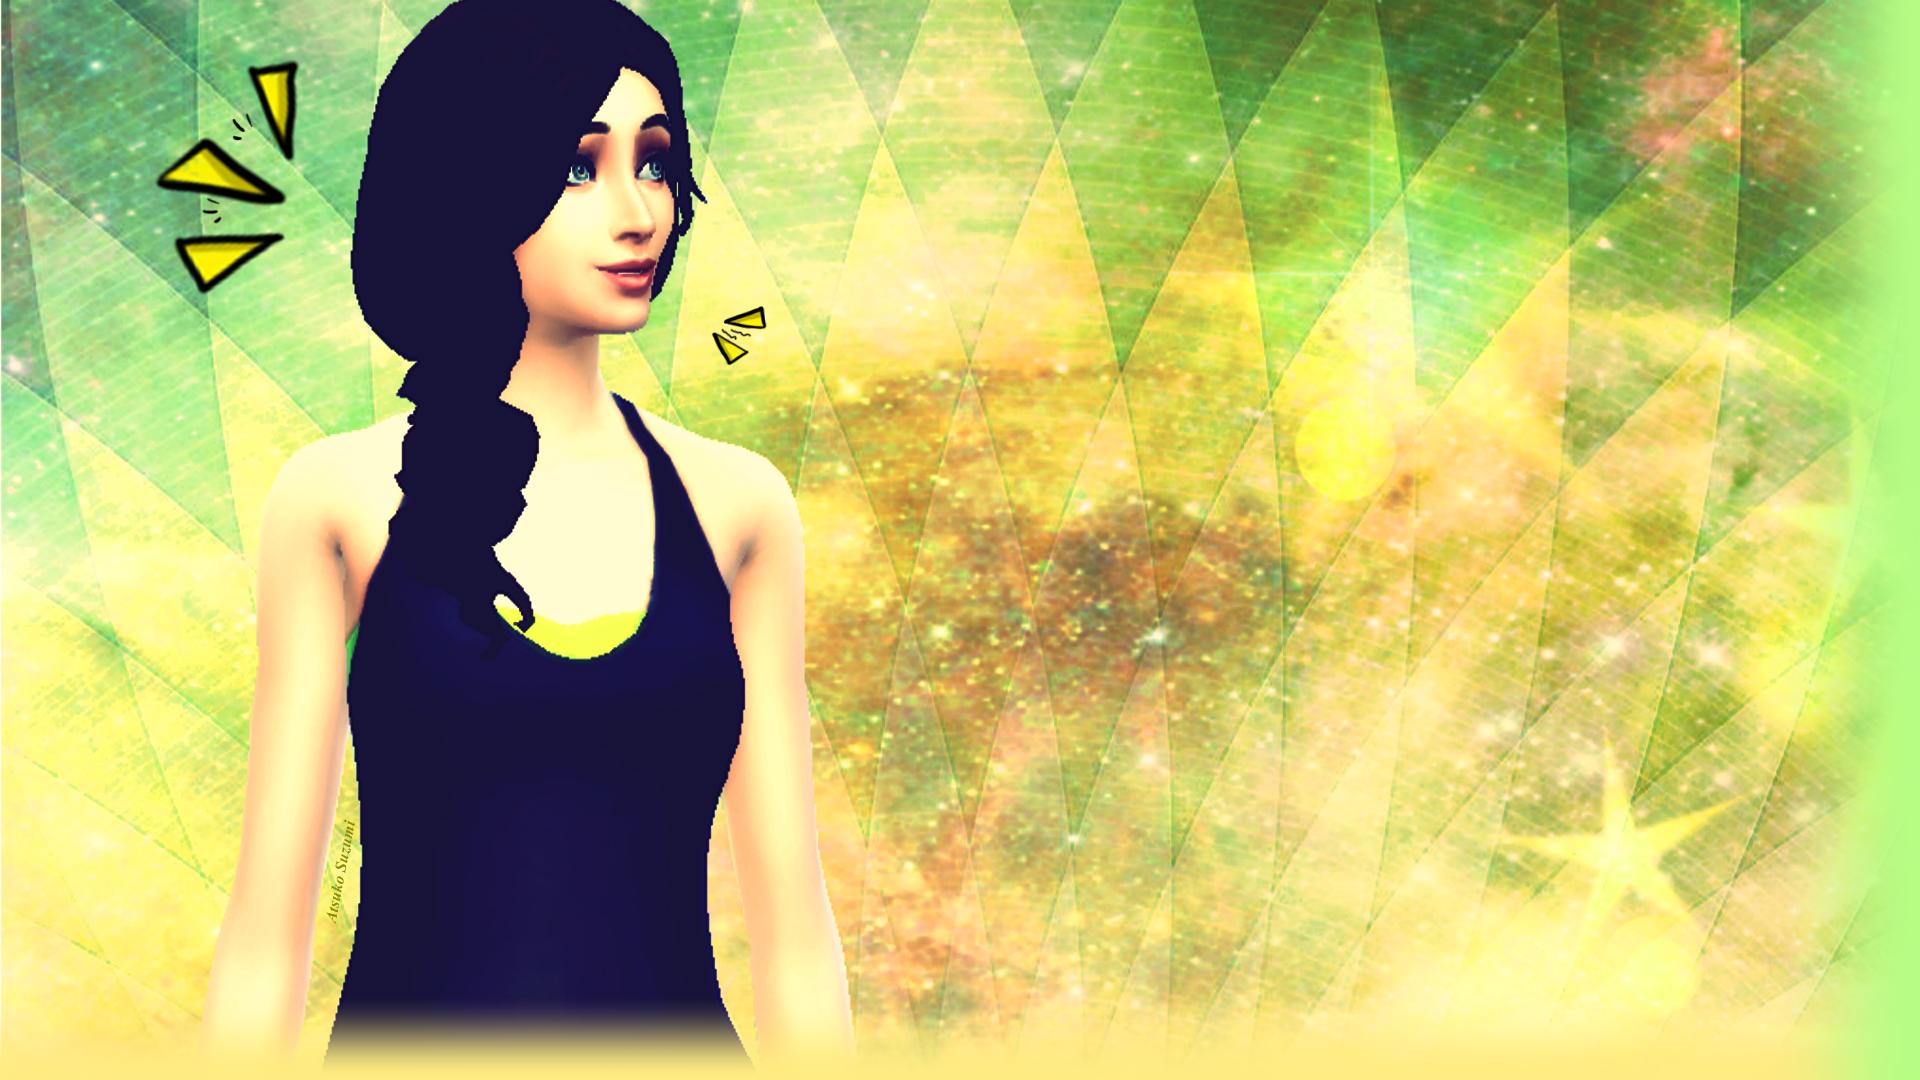 Wallpaper The Sims 4 By Suzumiatsuko On Deviantart